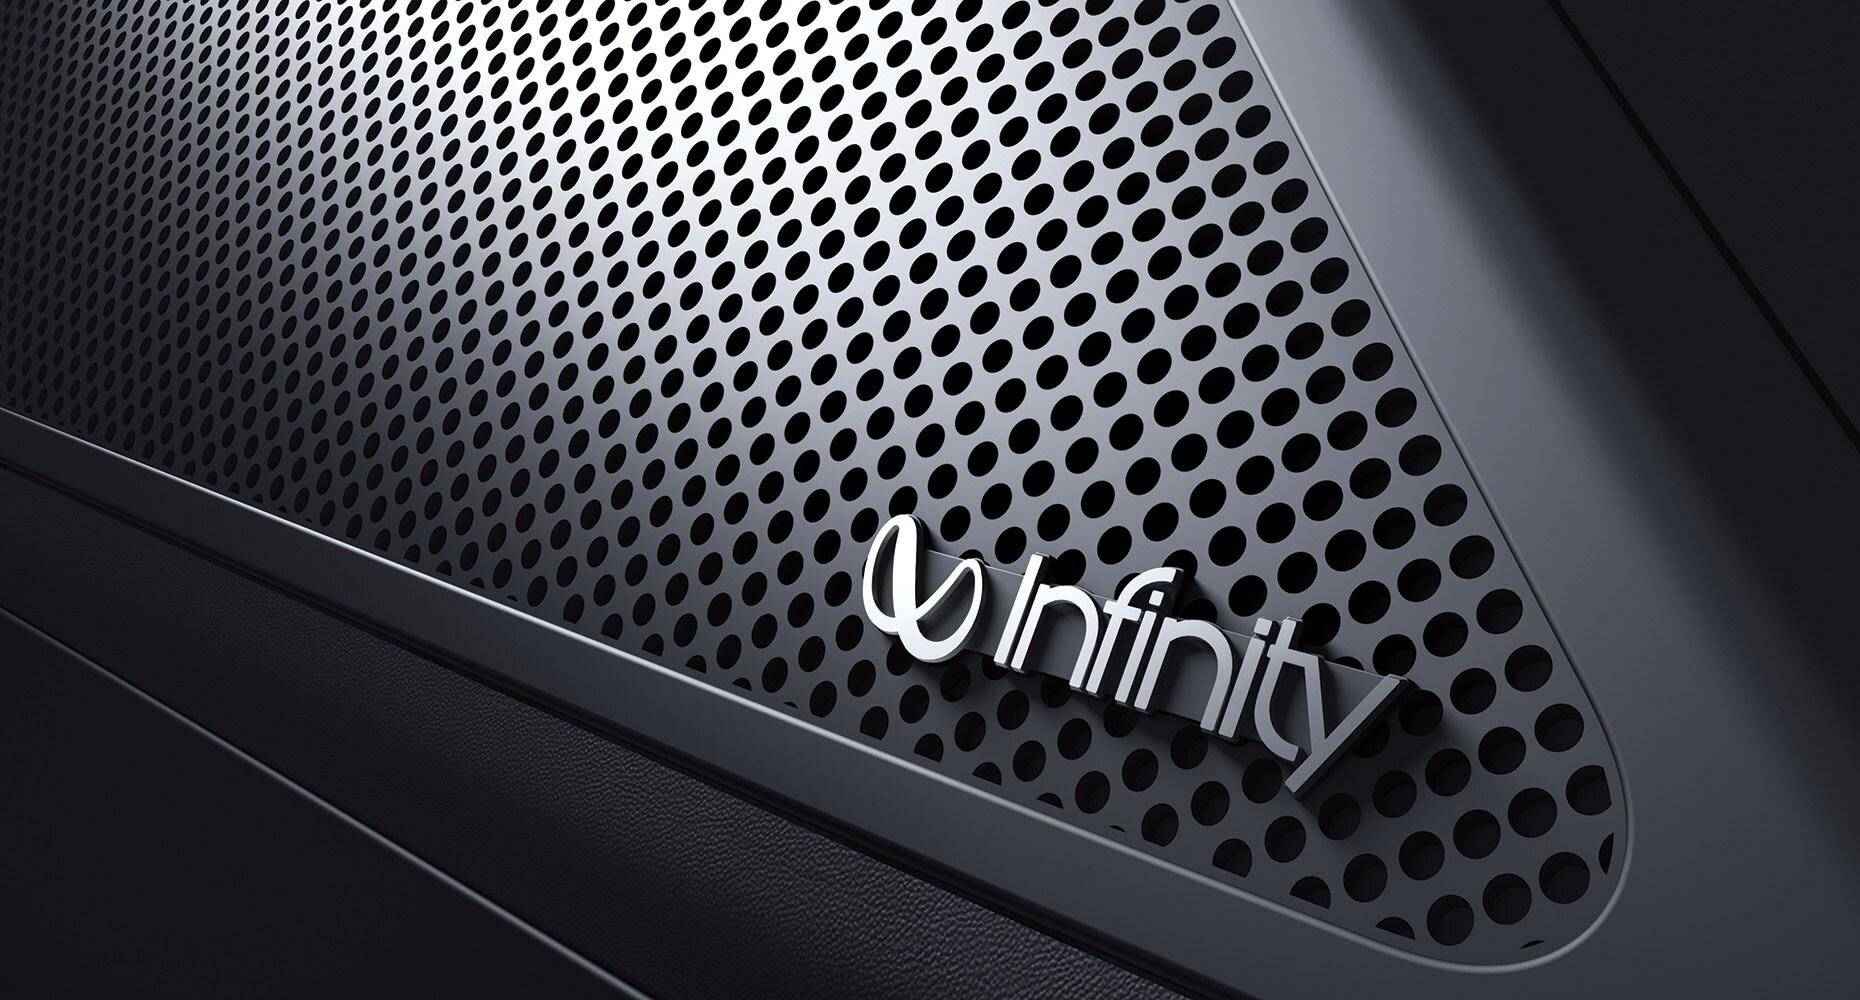 Infinity® audio system